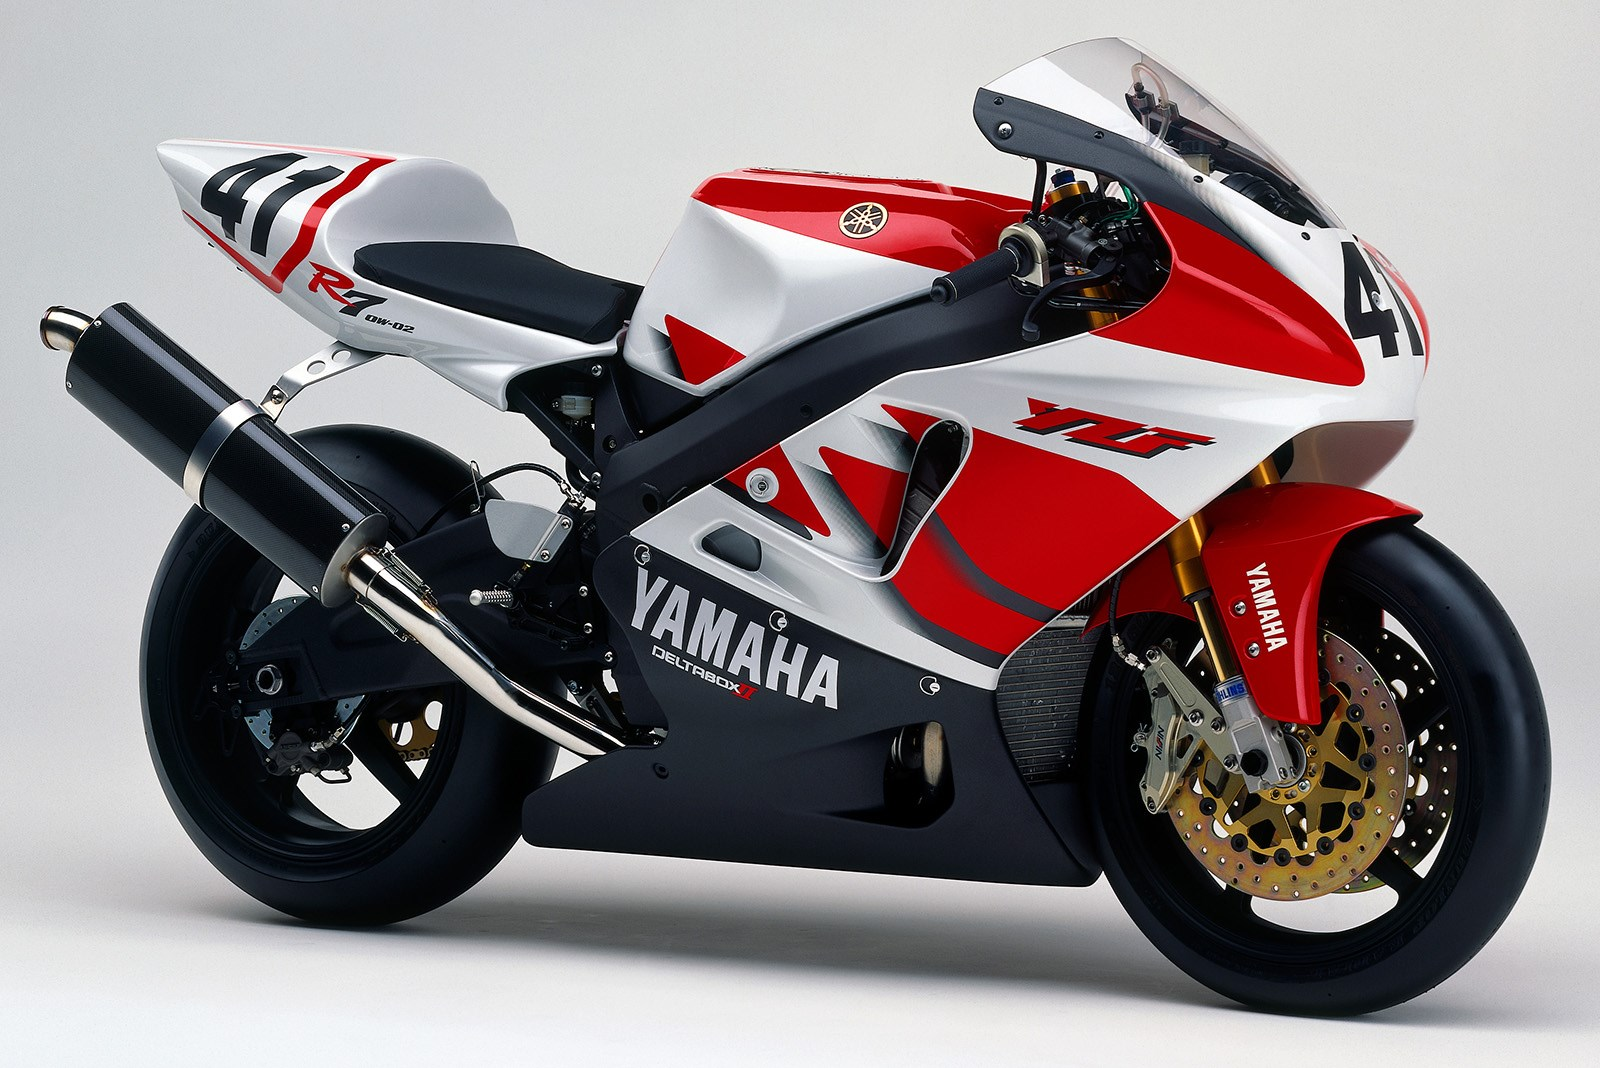 YAMAHA YZF-R7 (OW02) PARTS